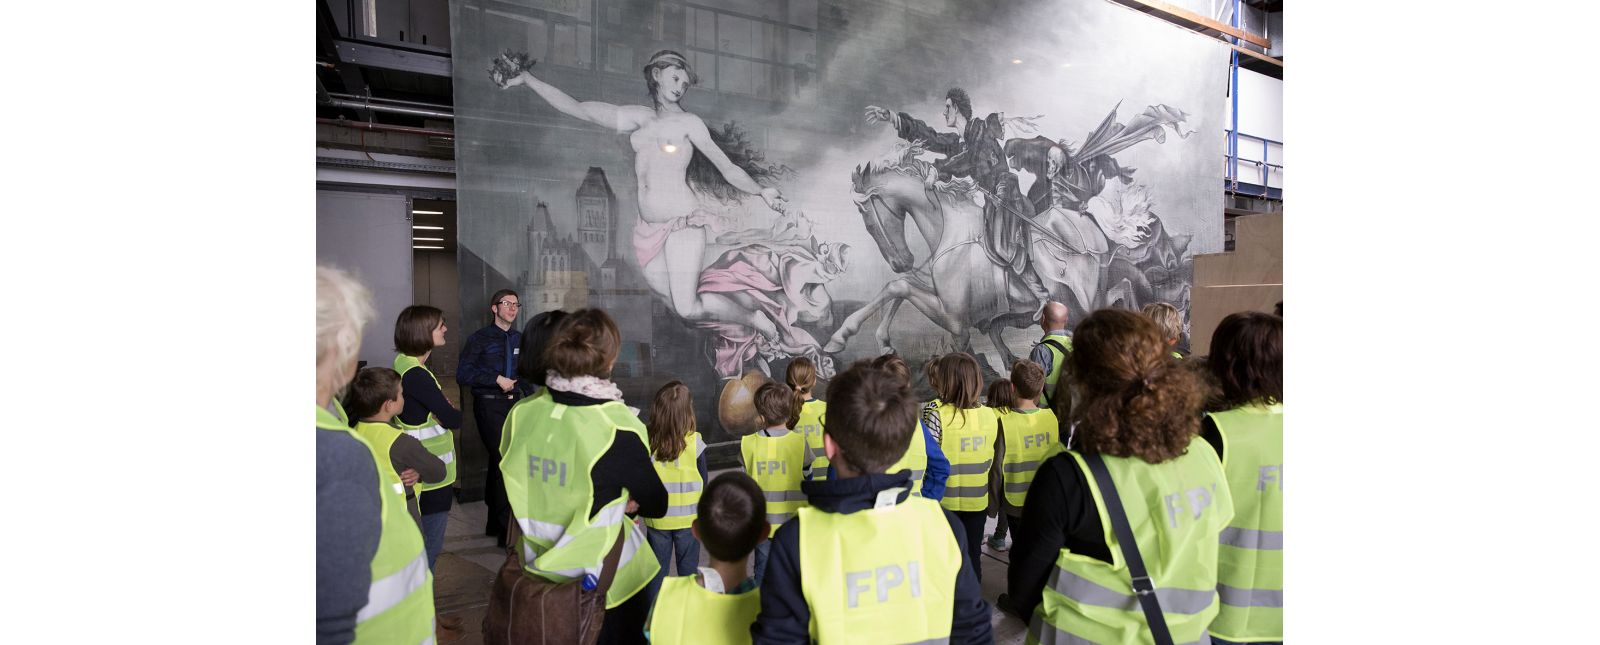 Geisterjagd durchs Theater // Michael Kaiser // 2015 // Rainer Muranyi